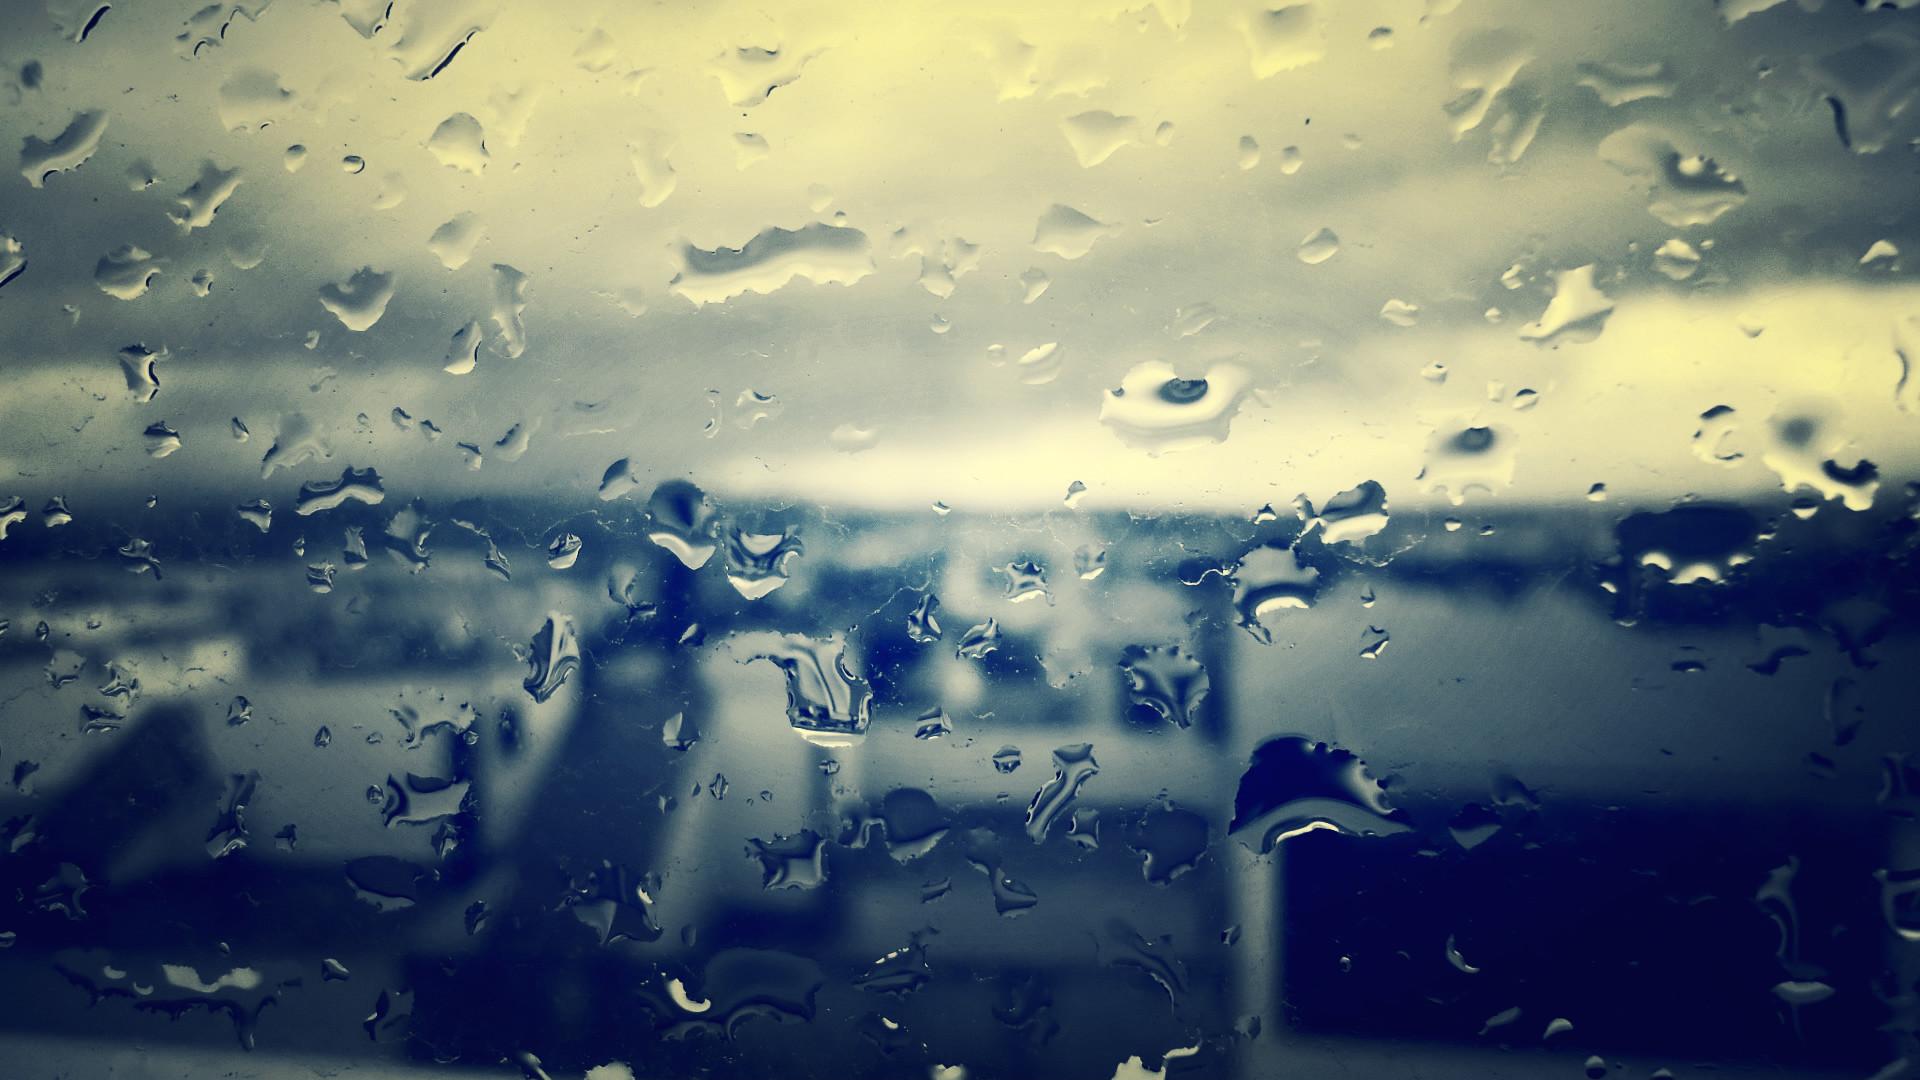 Rainy Day HD Wallpaper   Theme Bin – Customization, HD Wallpapers .